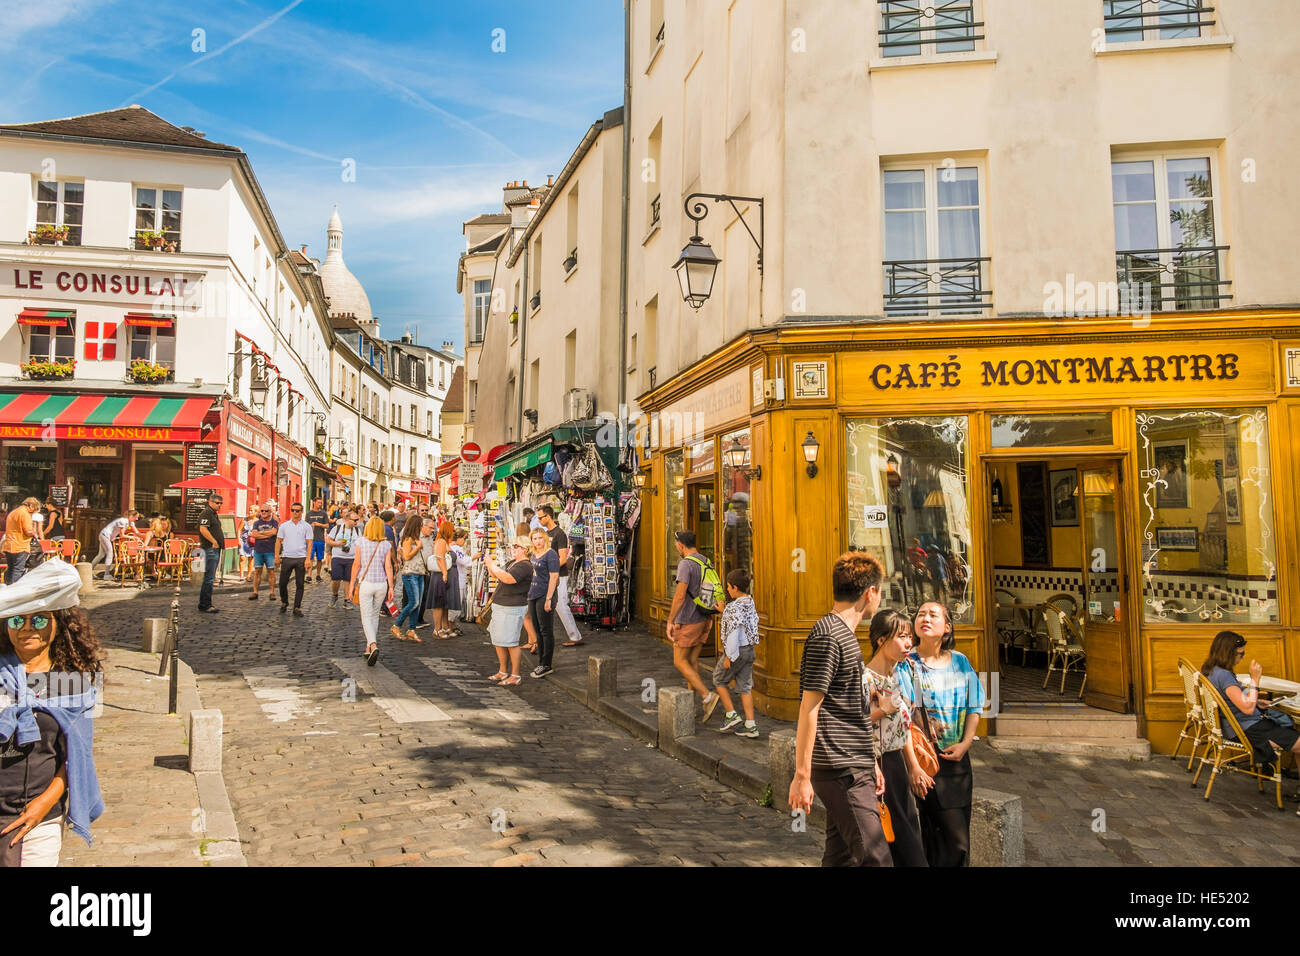 street scene montmartre district, tourists walking down cobblestone street - Stock Image